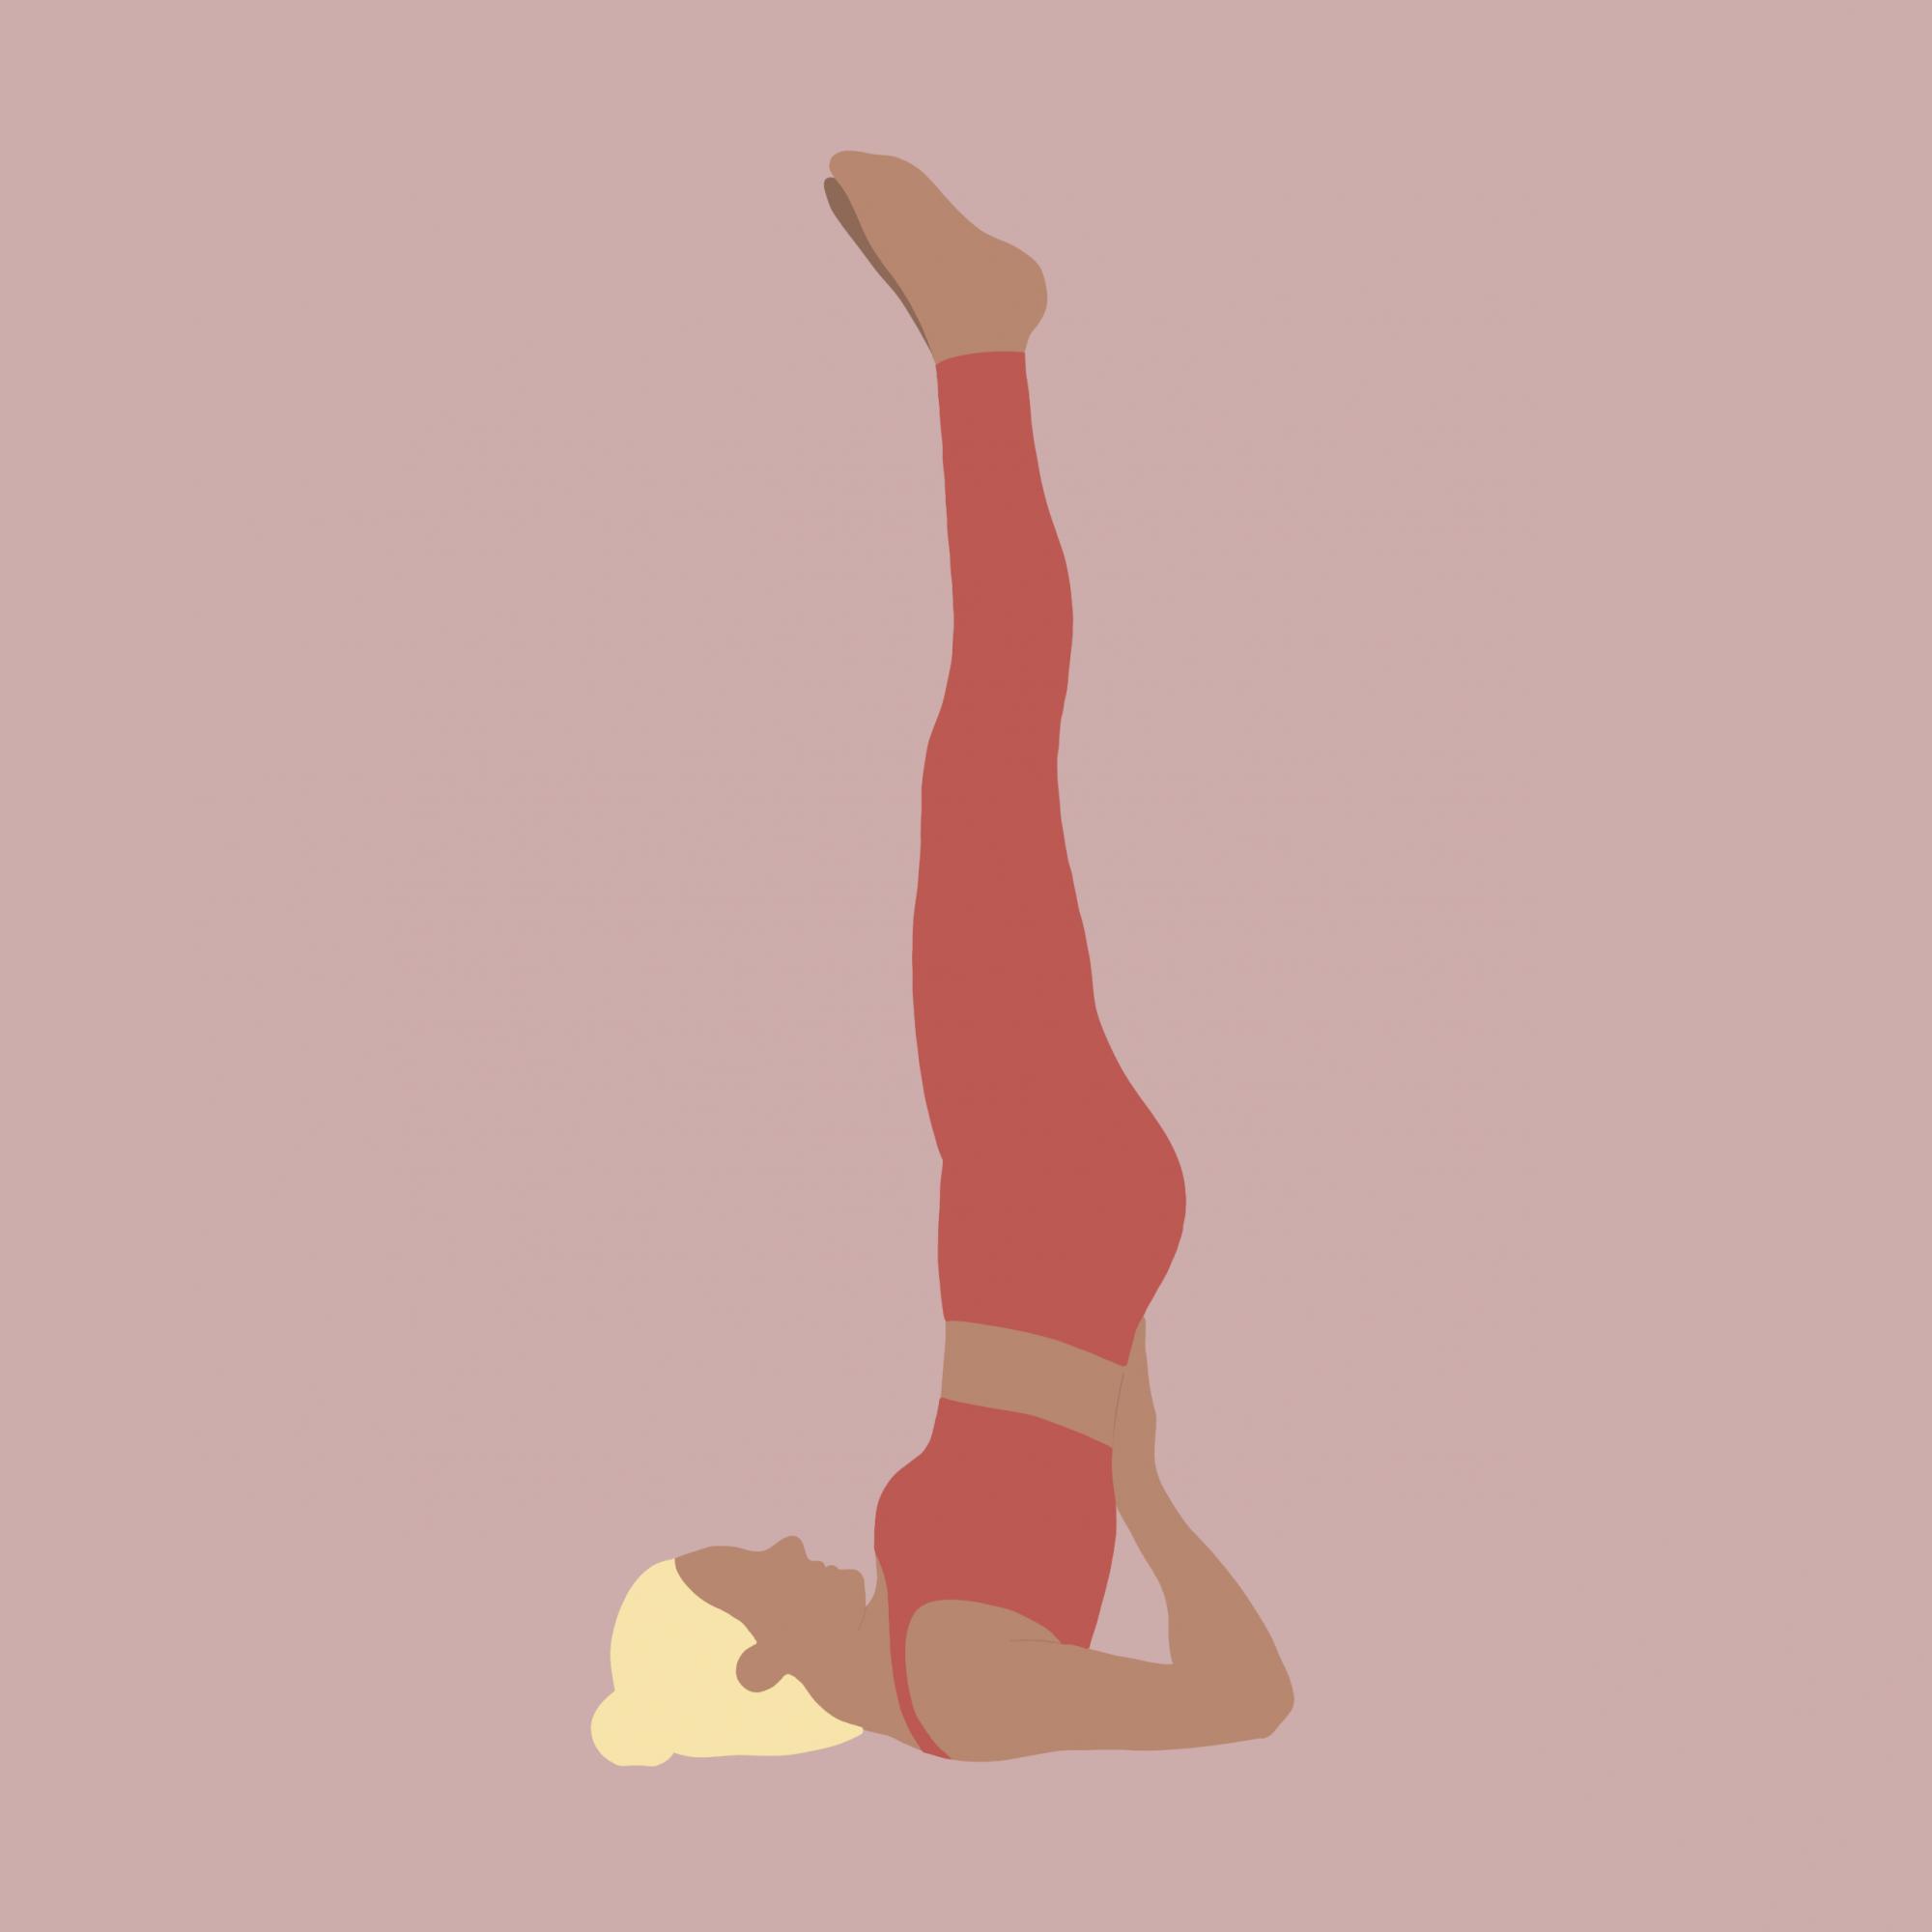 Illustration Yoga-Übung Schulterstand